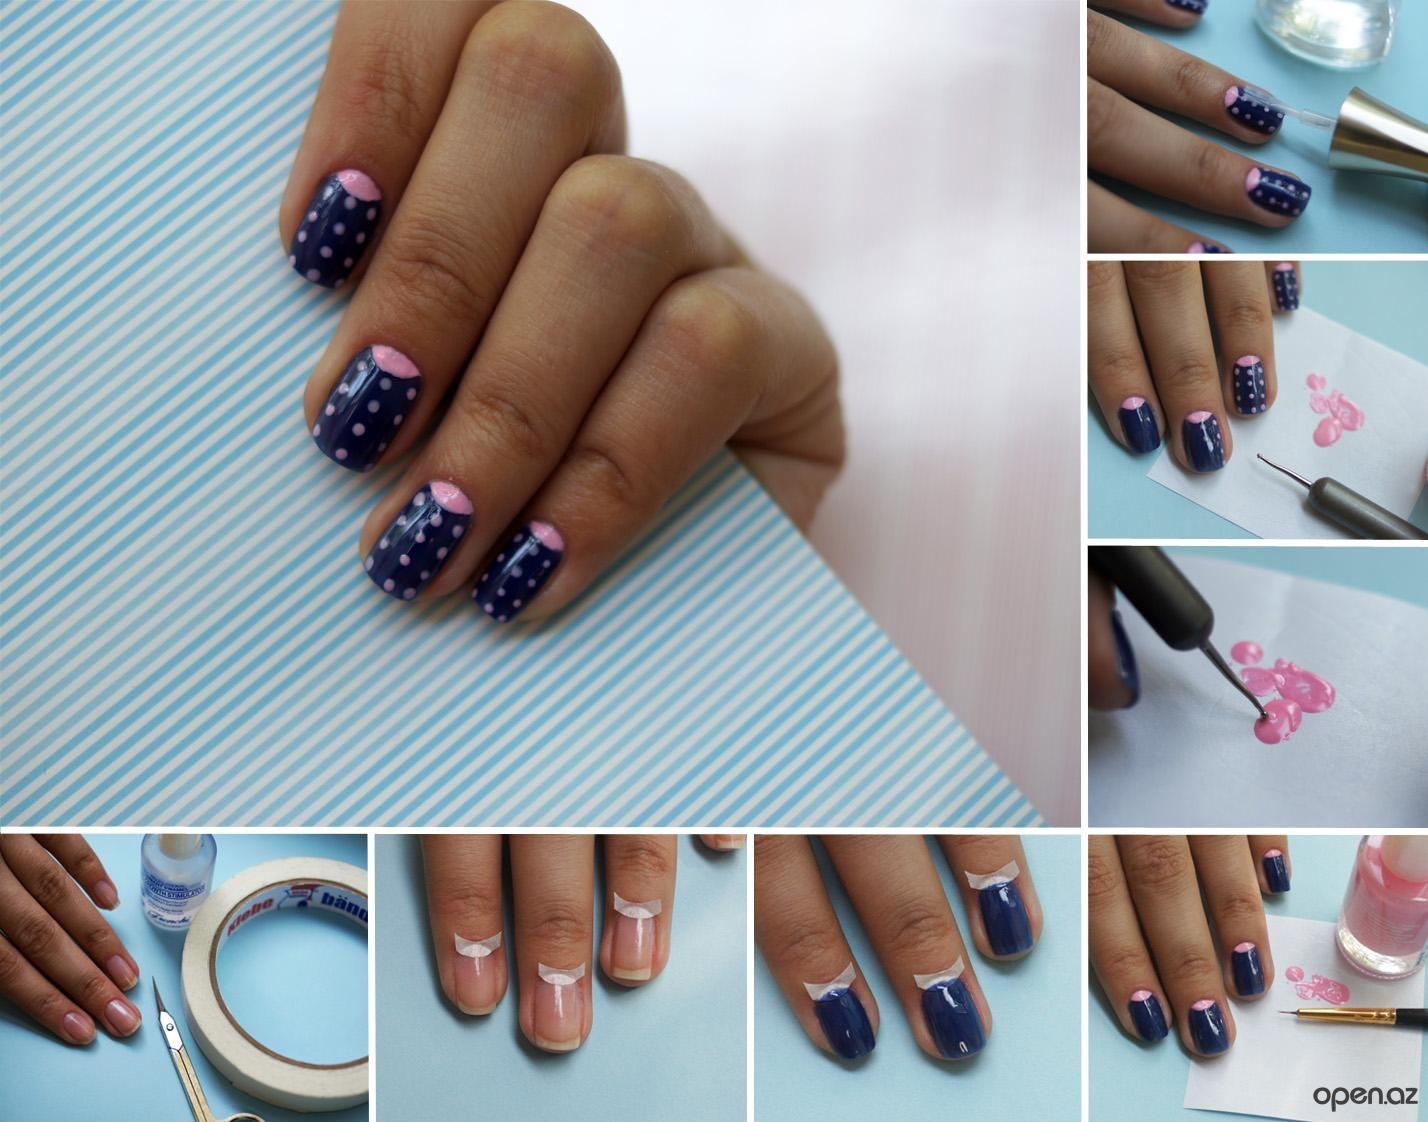 Marble Nail Art Tutorial/CND Shellac Cnd shellac colors, She